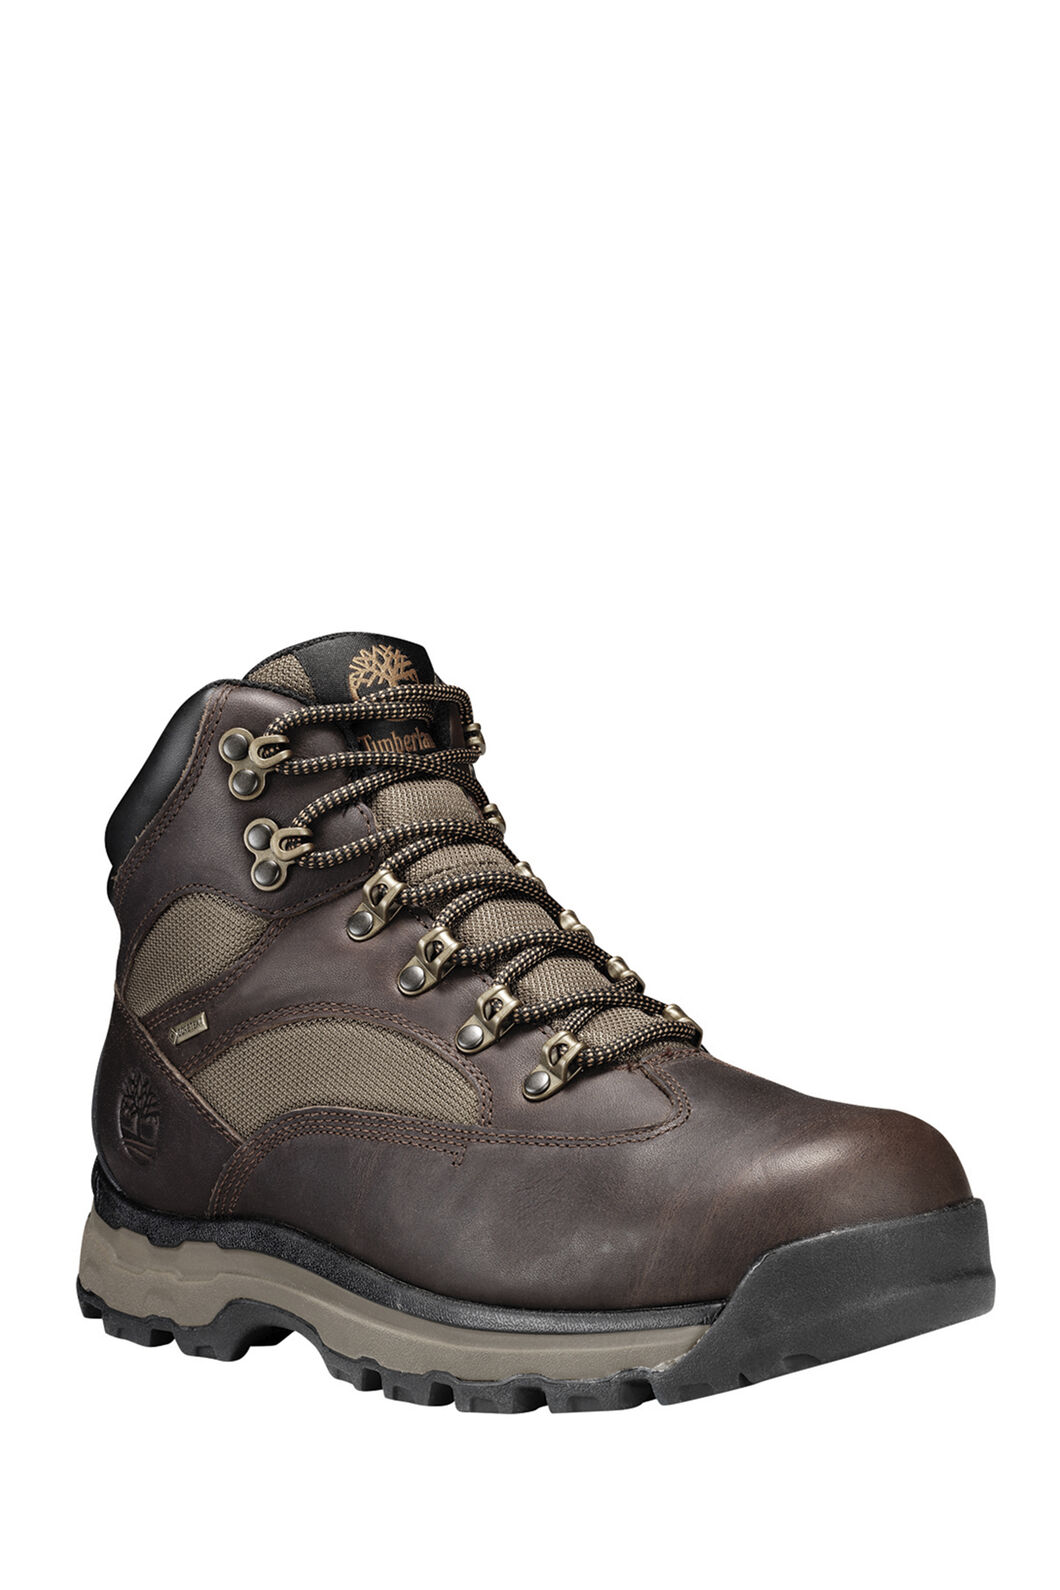 Timberland Chocorua Trail 2.0 WP Hiking Boots — Men's, DARK BROWN FULL-GRAIN, hi-res